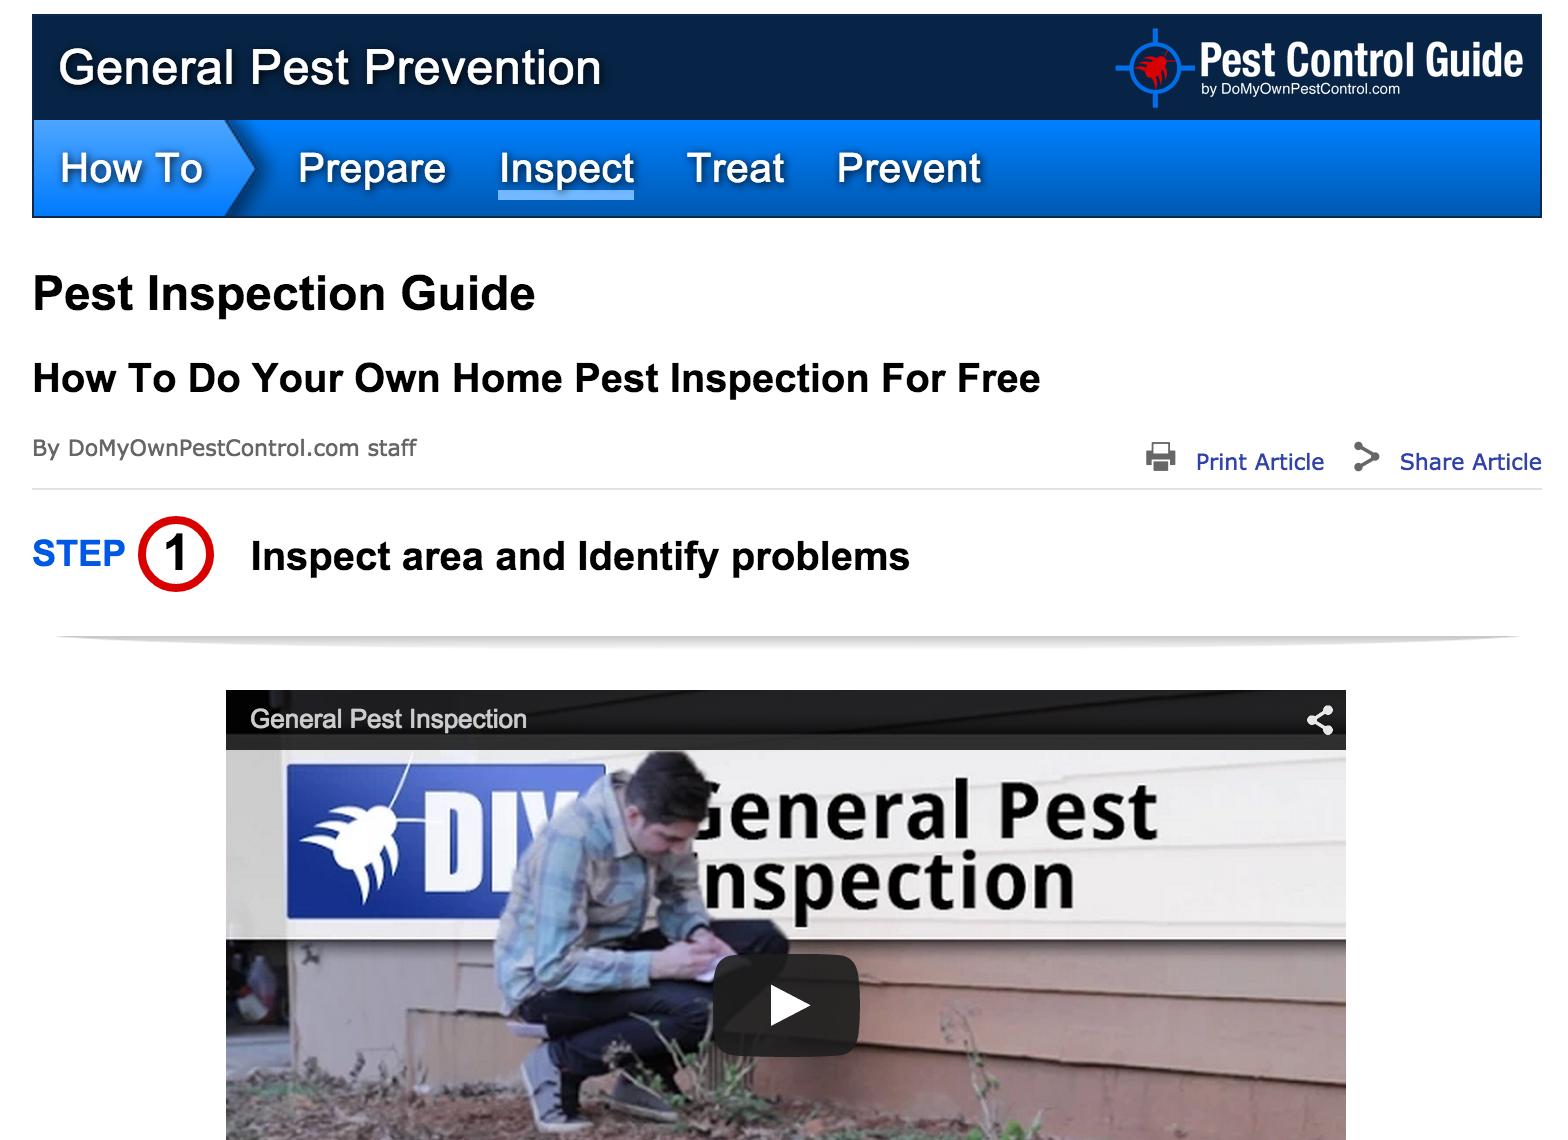 general pest inspection guide screenshot